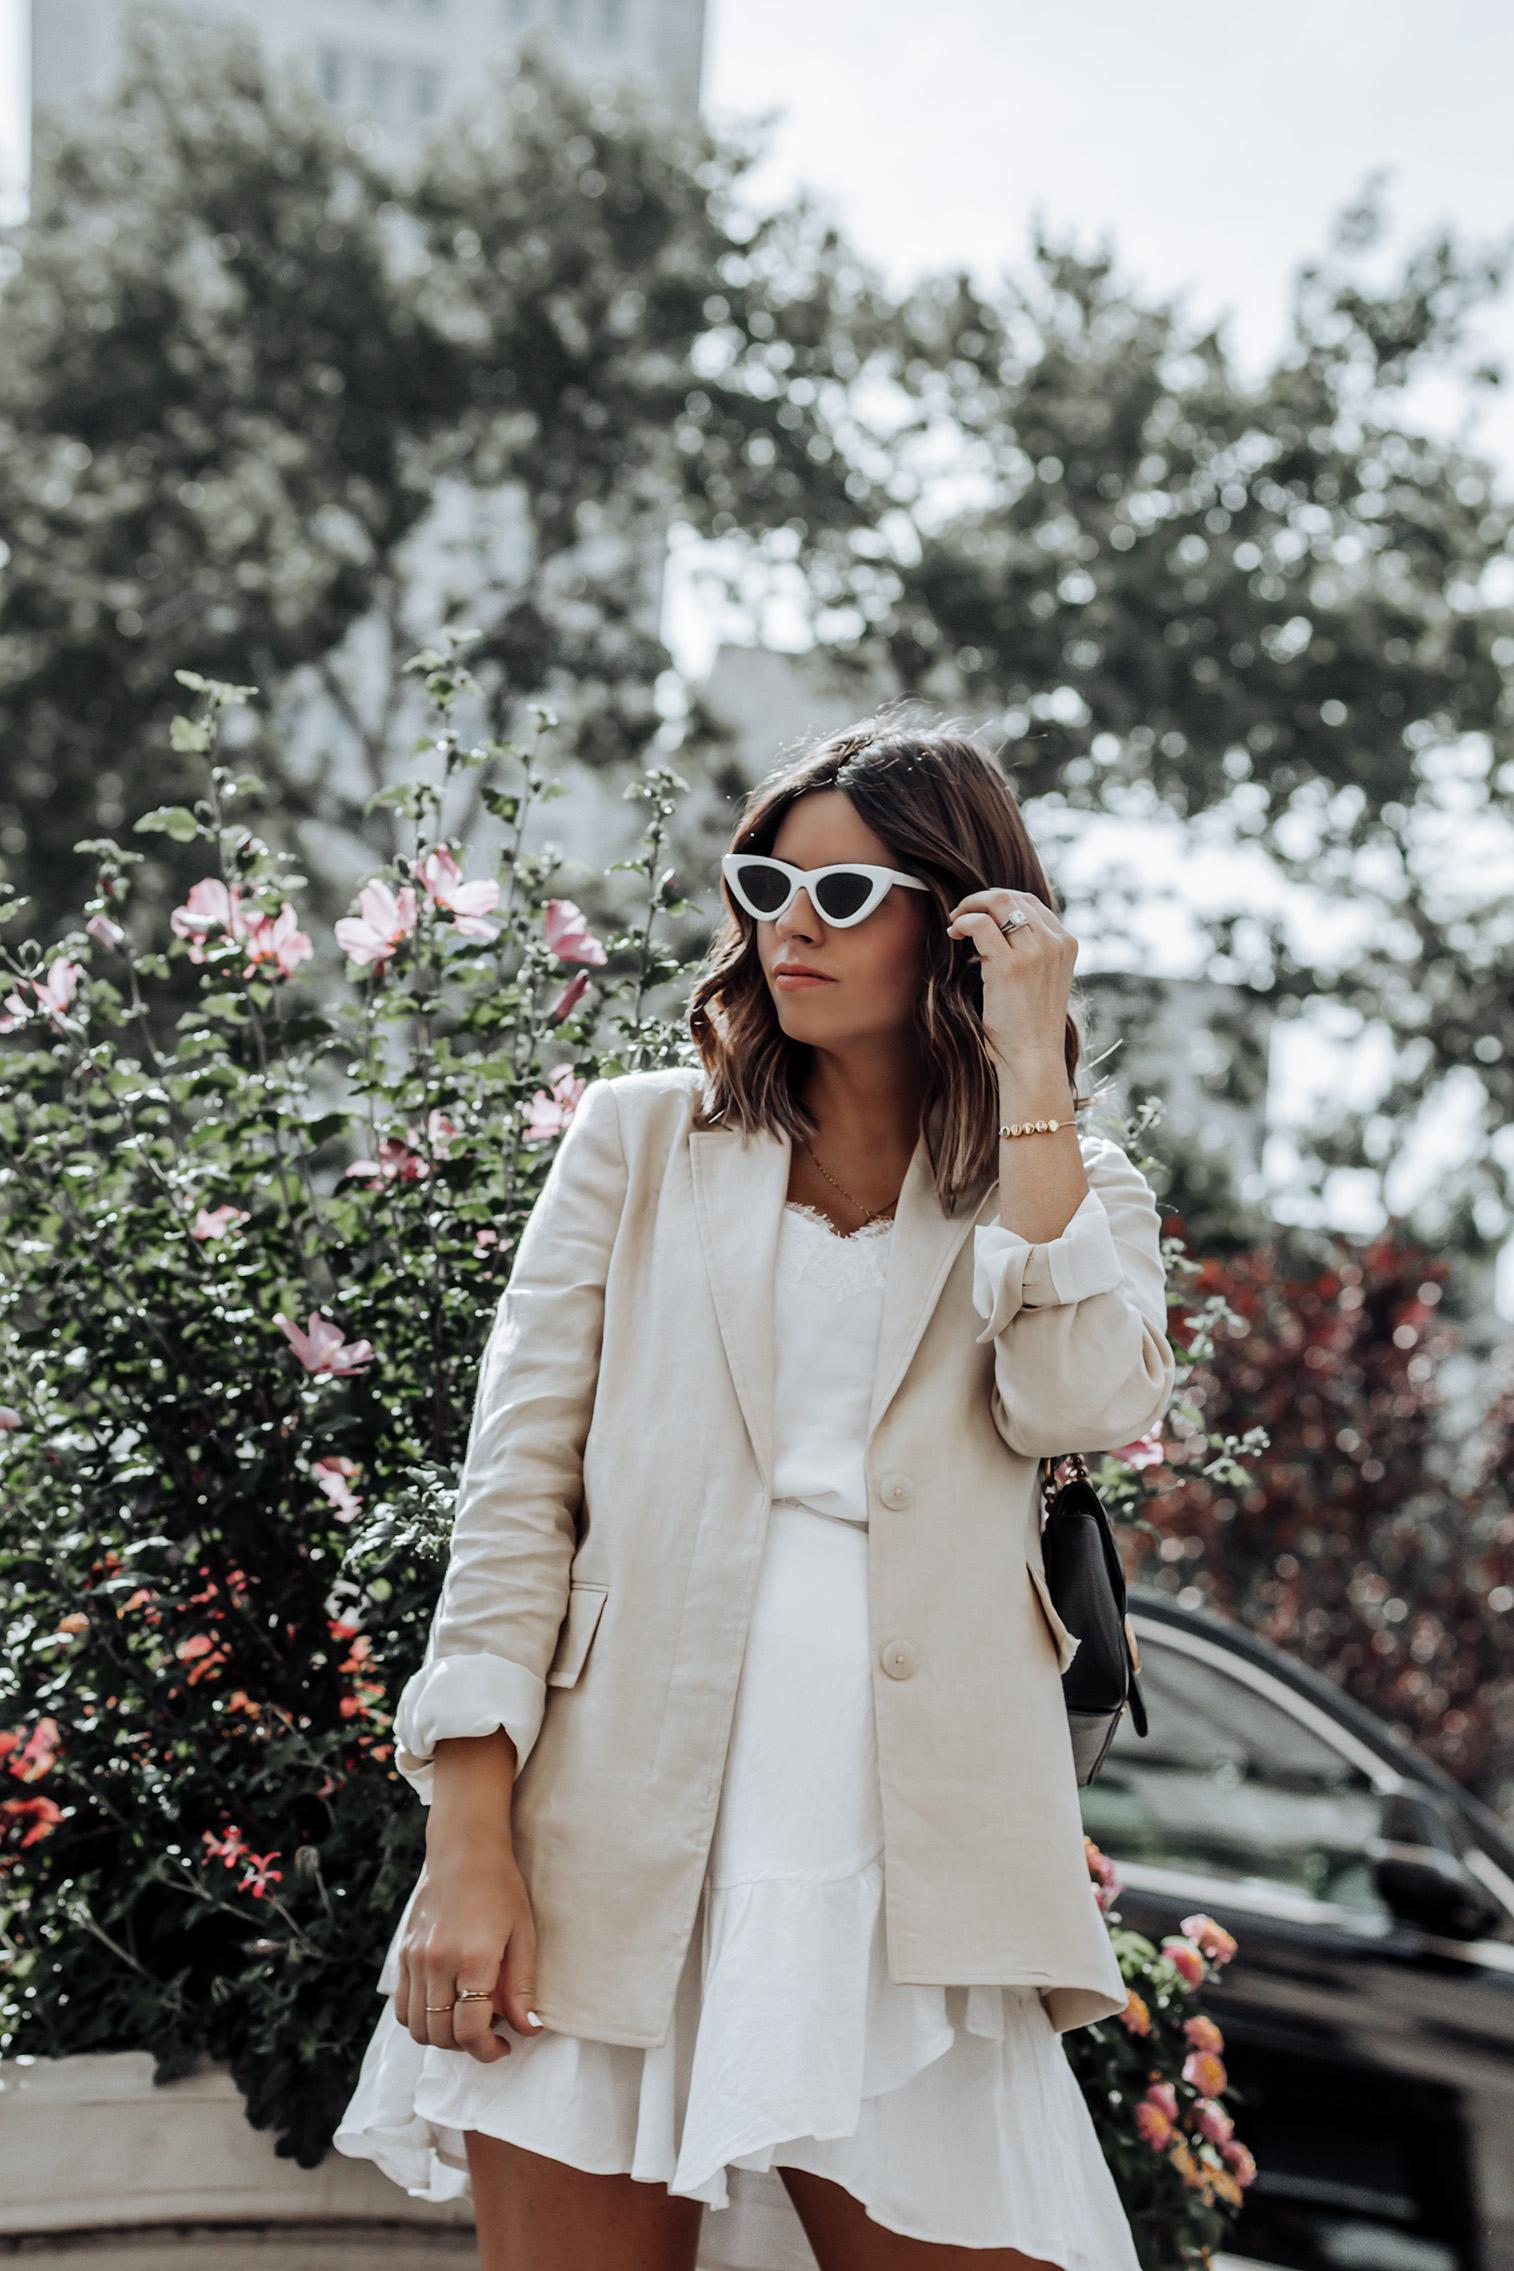 Muted Yellow Blazer | Ruffle Mini Skirt | Lolita White Sunglasses | Gucci Marmont Bag | Steve Madden Agent Slingbacks #liketkit #reffleskirt #streetstyle #nycblogger